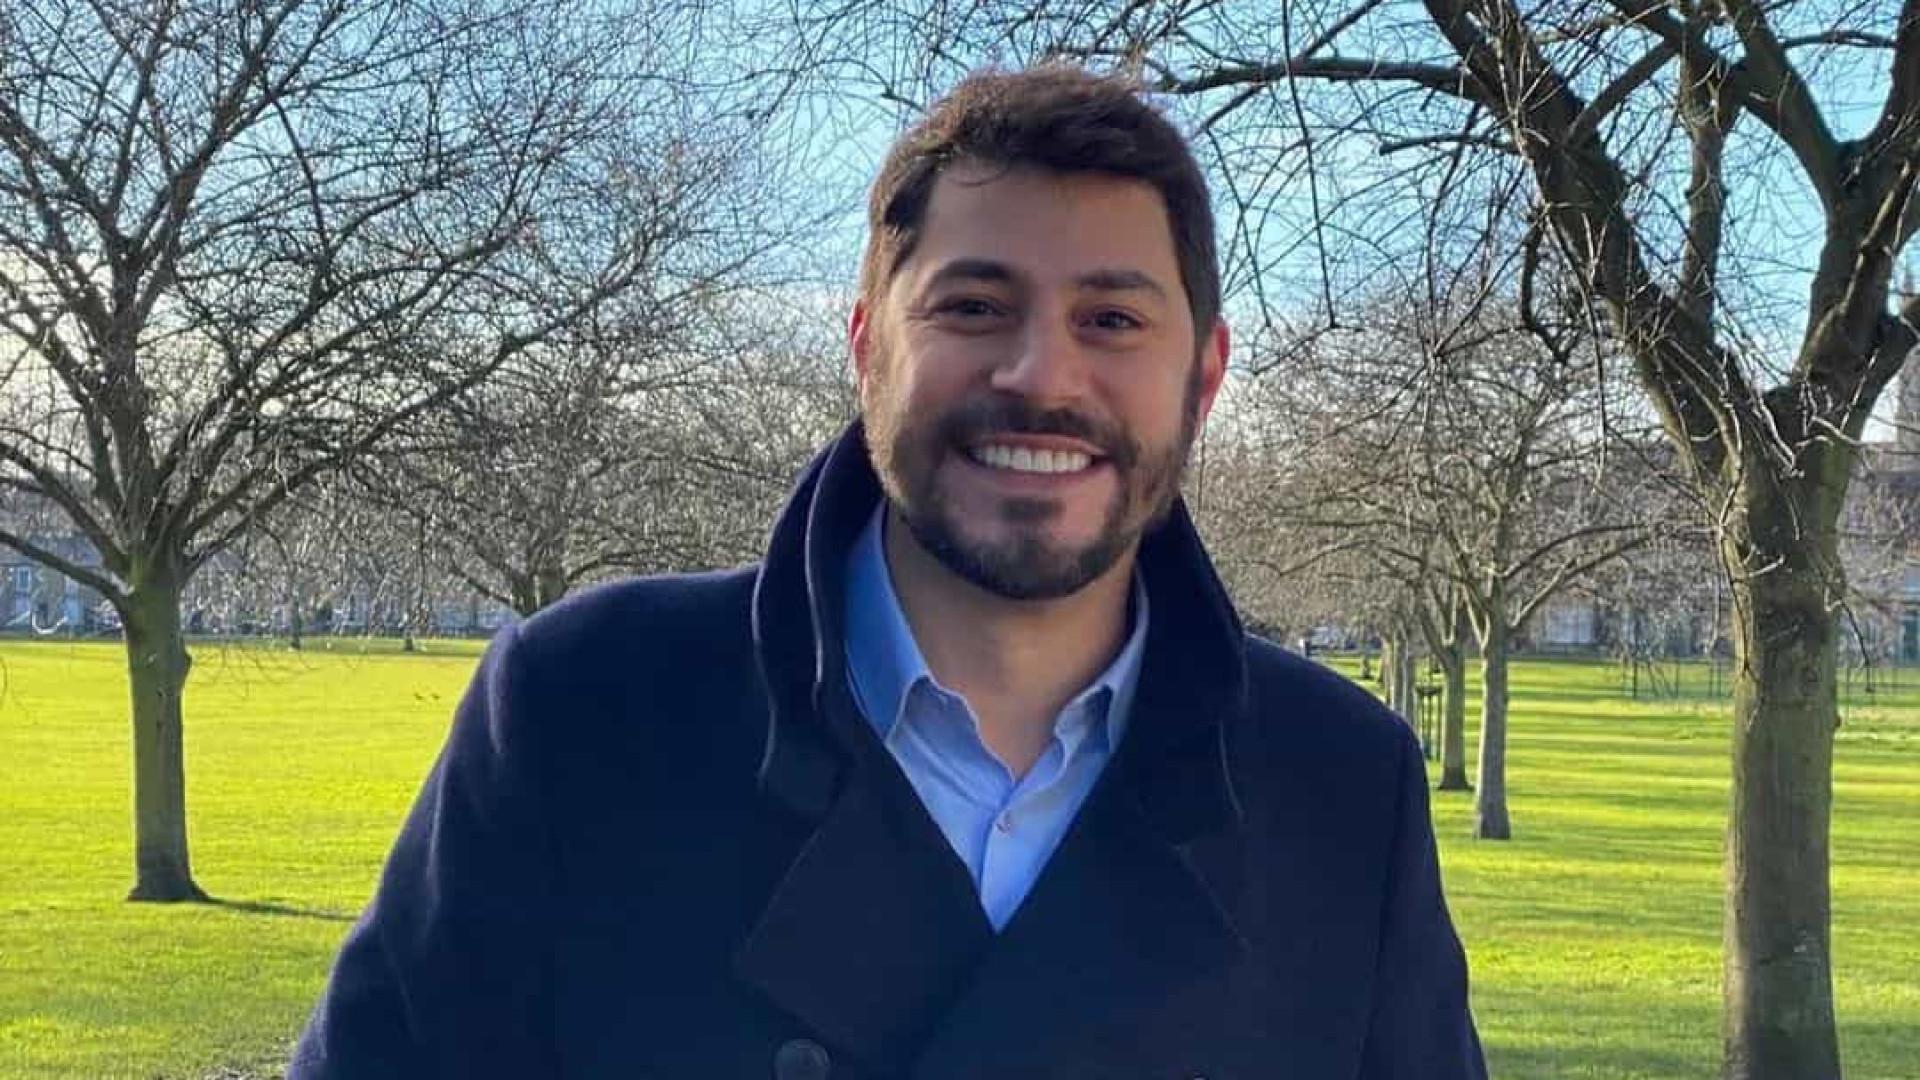 Evaristo Costa comenta saída da CNN Brasil: 'Chutado pela porta dos fundos'